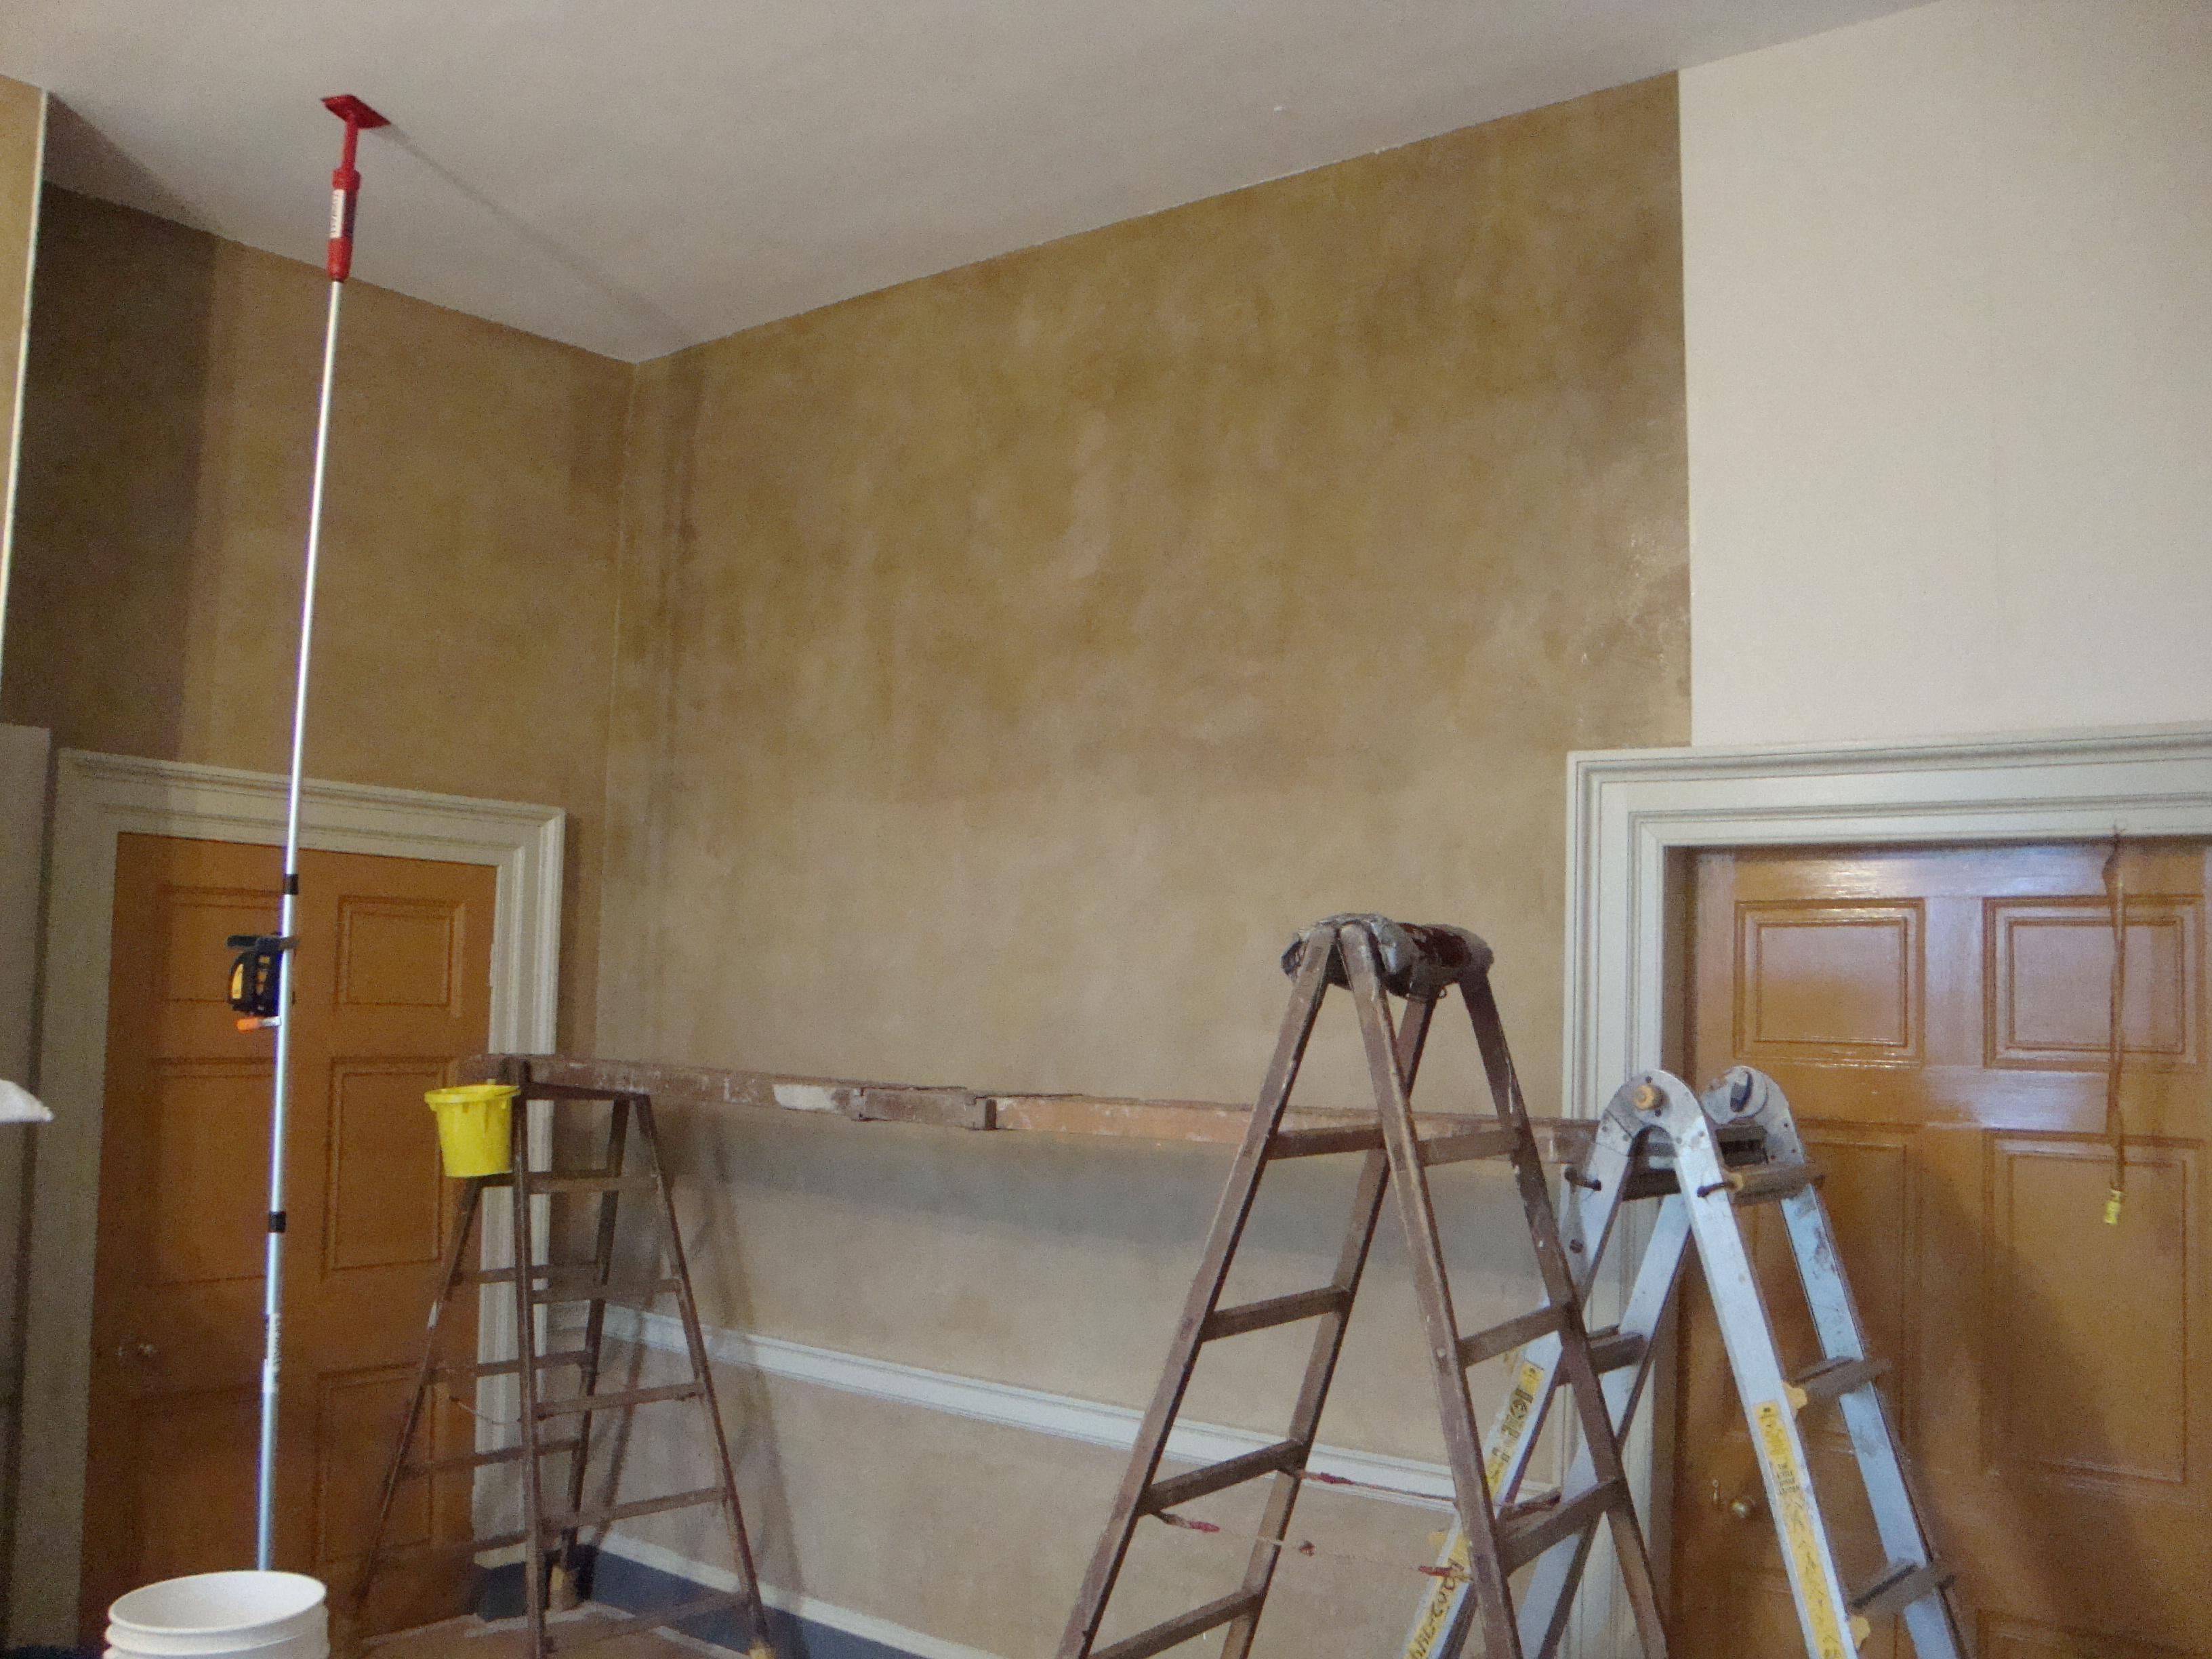 Patrick Shields Wallpaper Installation Washington DC Metro Area 3264x2448